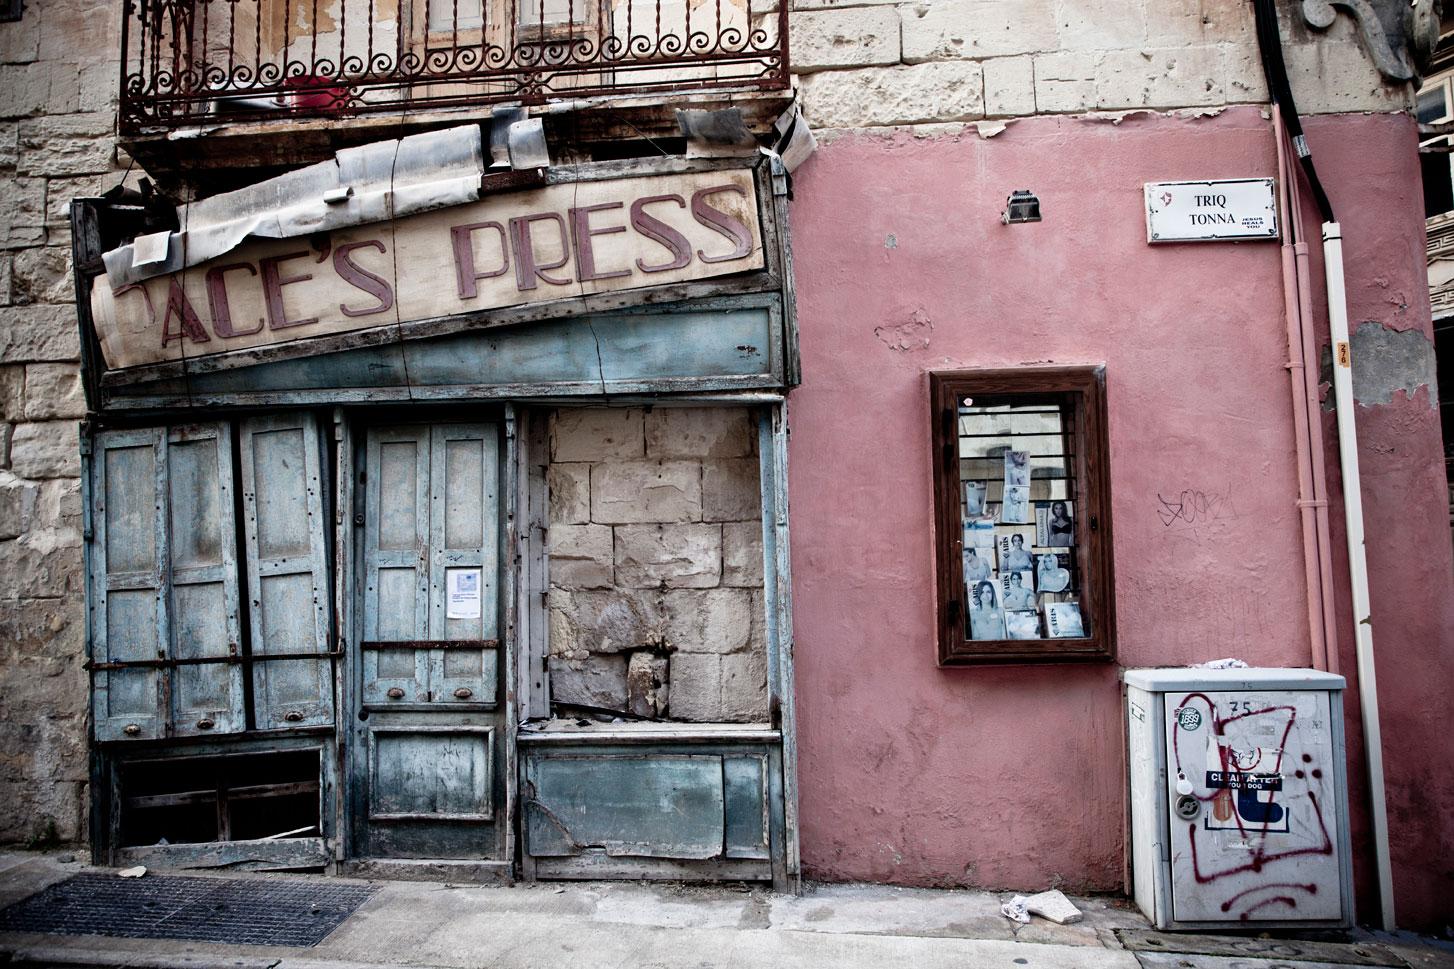 Wabi Sabi - Facades & Store Fronts, Malta - Paces Press, Gzira ©Helen Jones-Florio